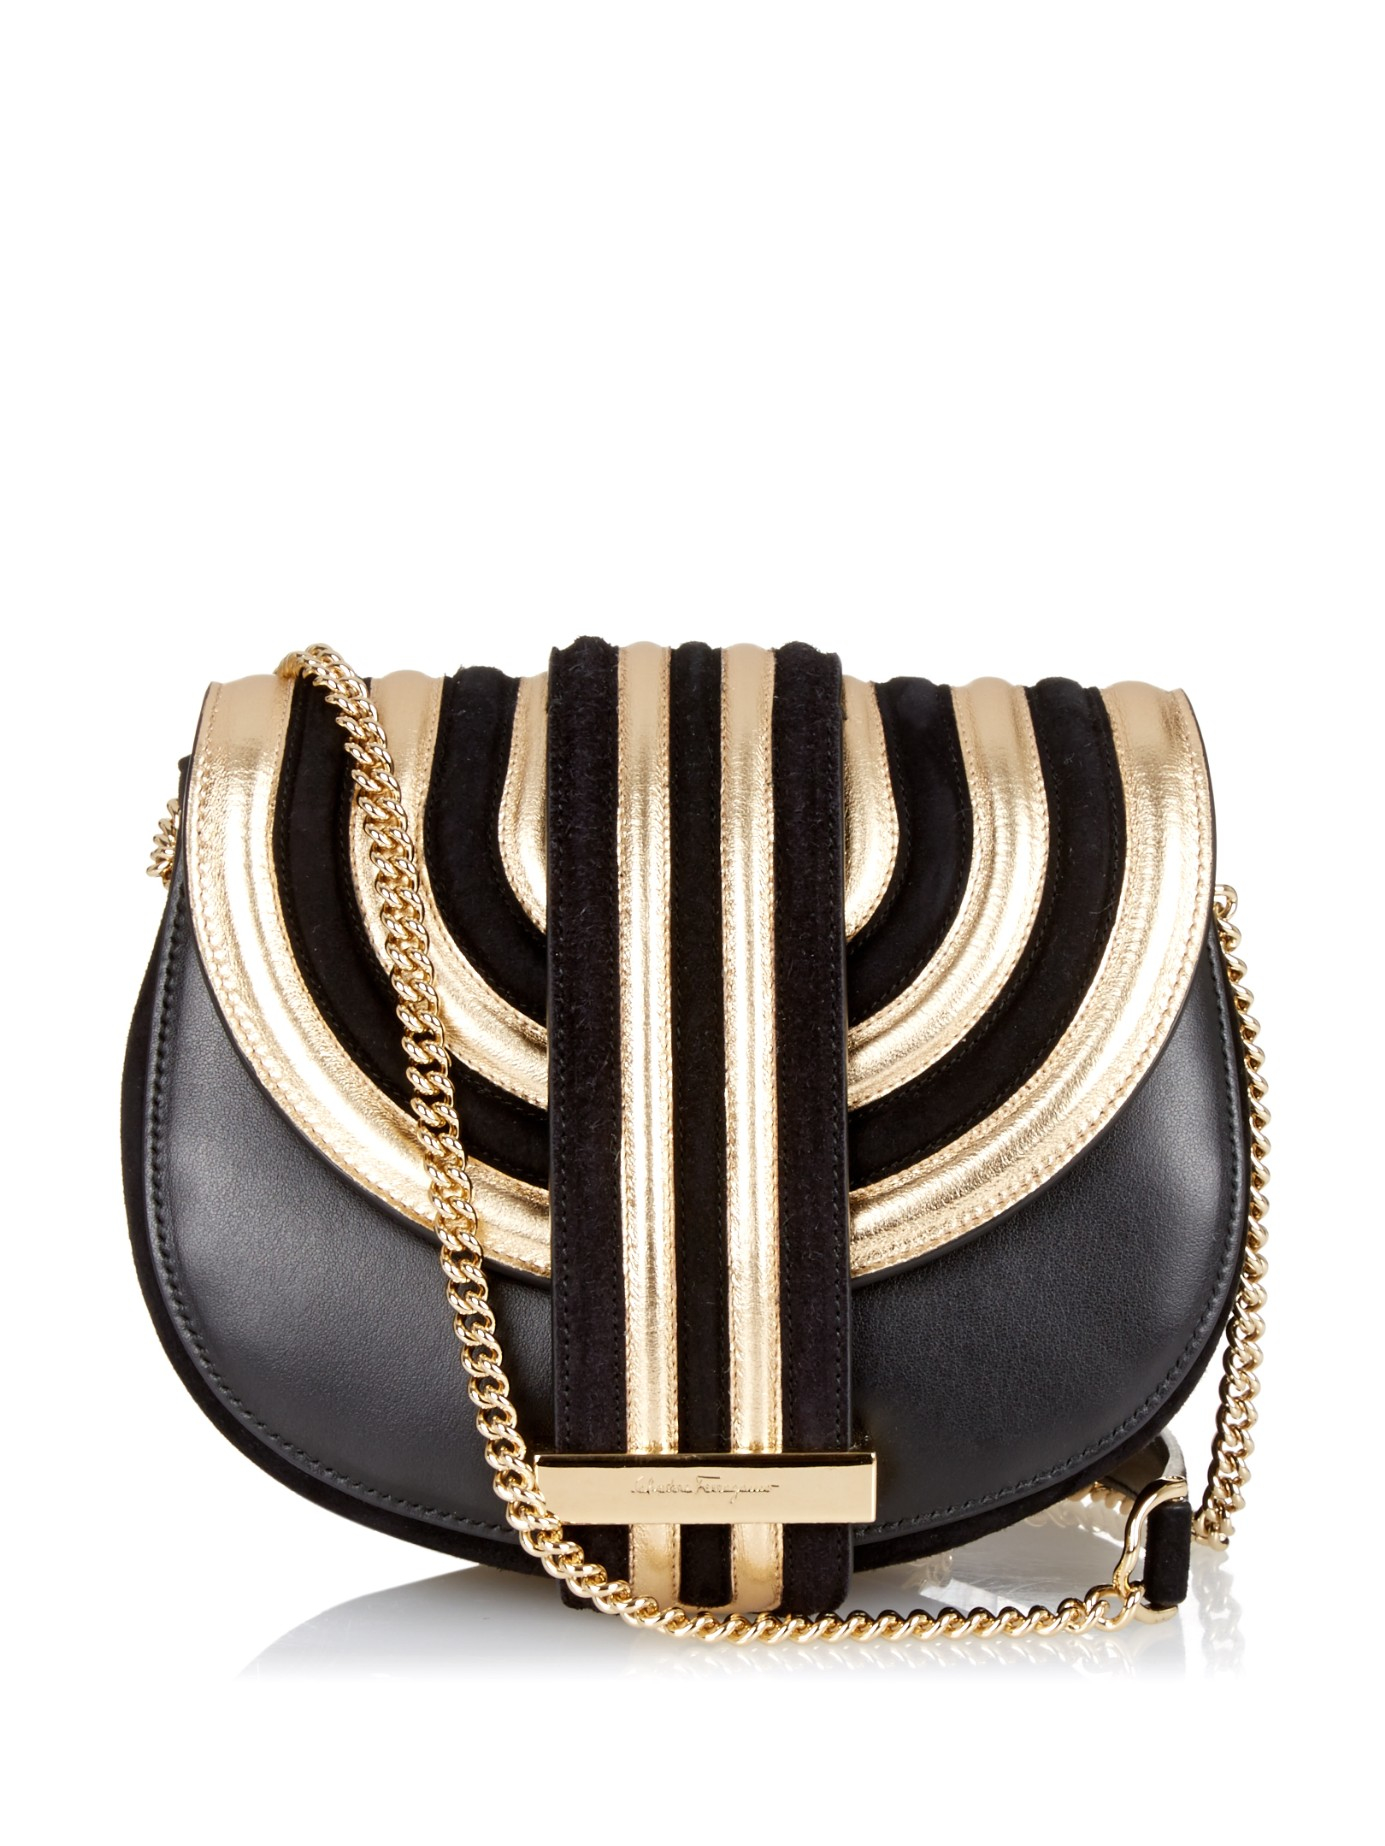 c76310d6 Ferragamo Black Rosetta Suede and Leather Shoulder Bag